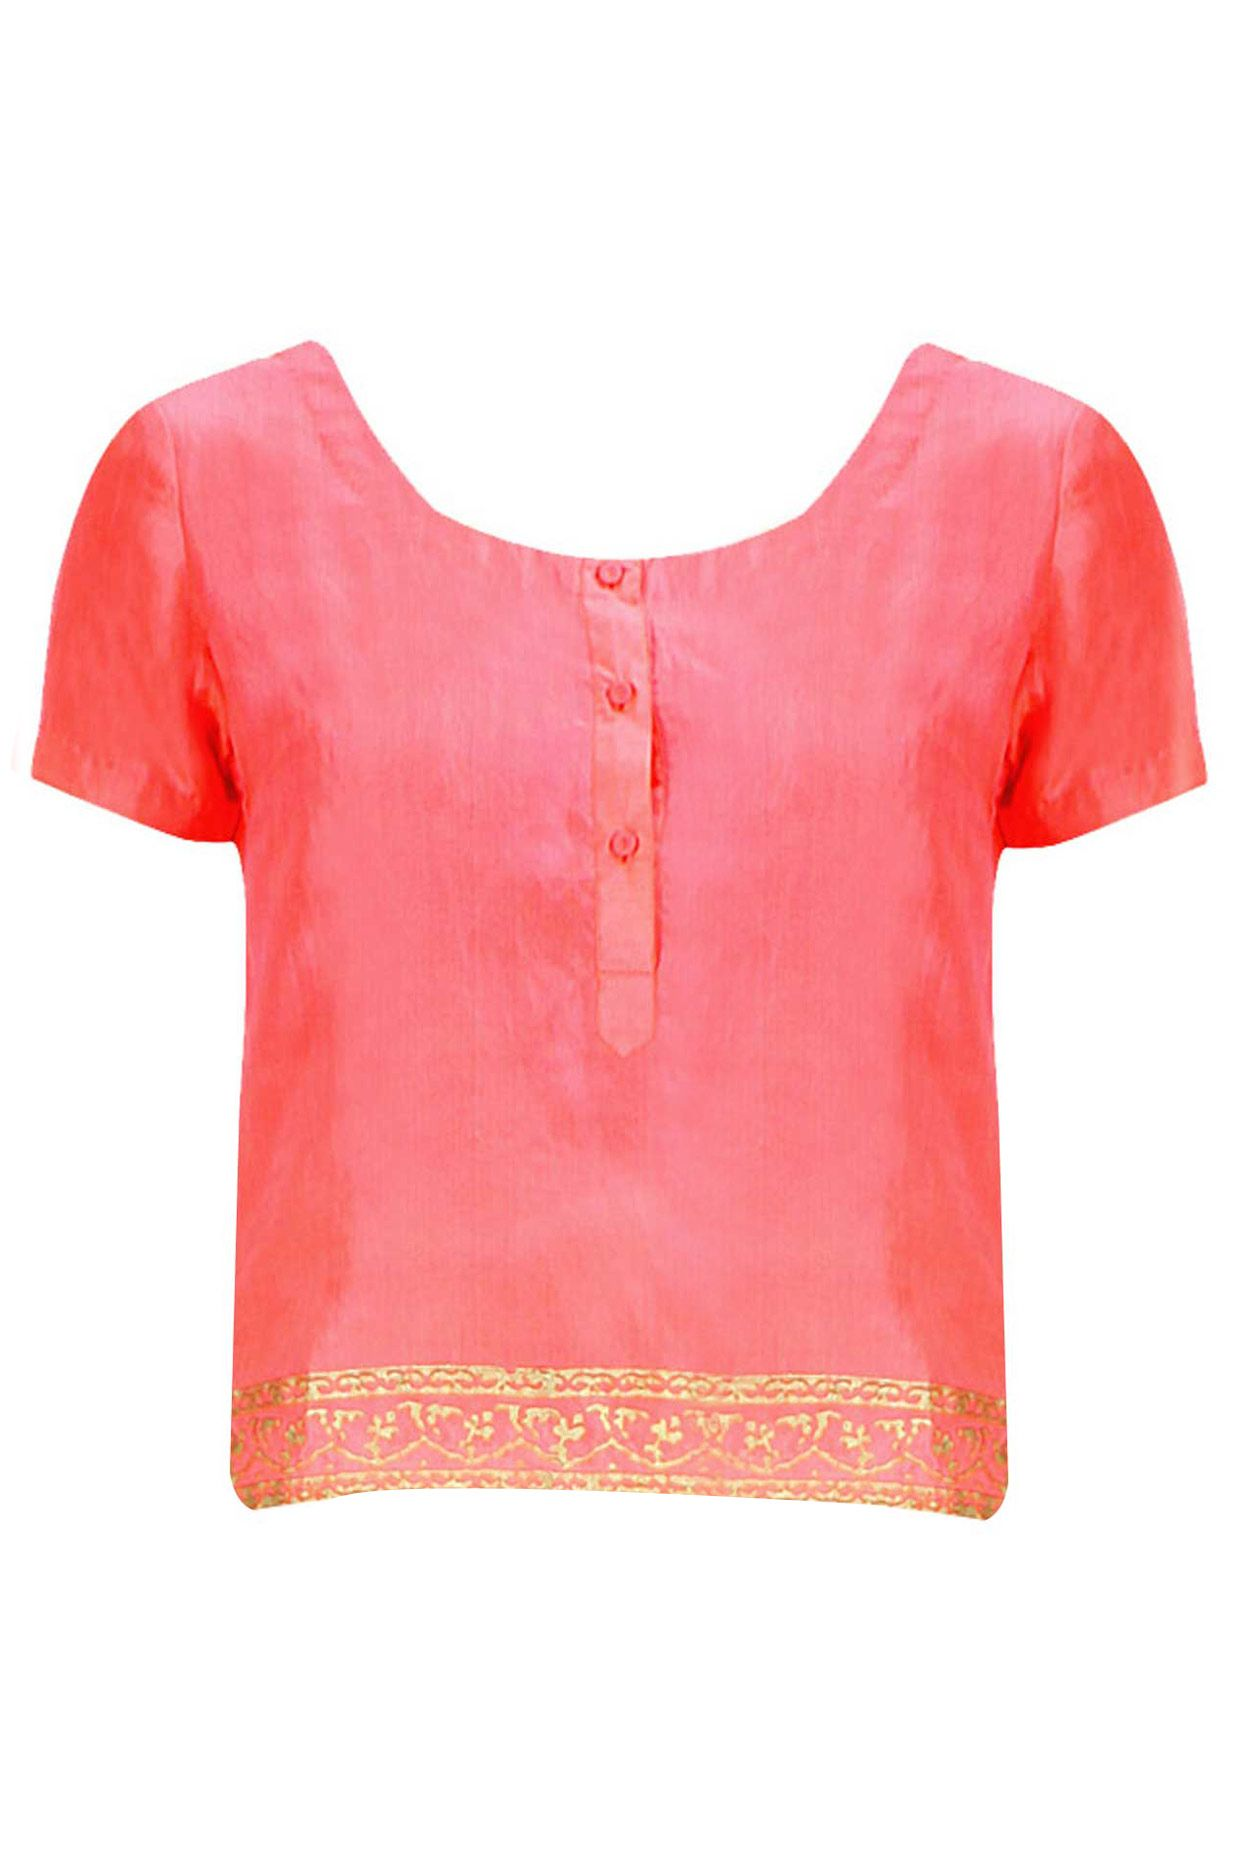 be75b1c4dc Pink silk top. By Anupamaa Dayal. #designer #indian #stylish #shopnow  #perniaspopupshop #happyshopping